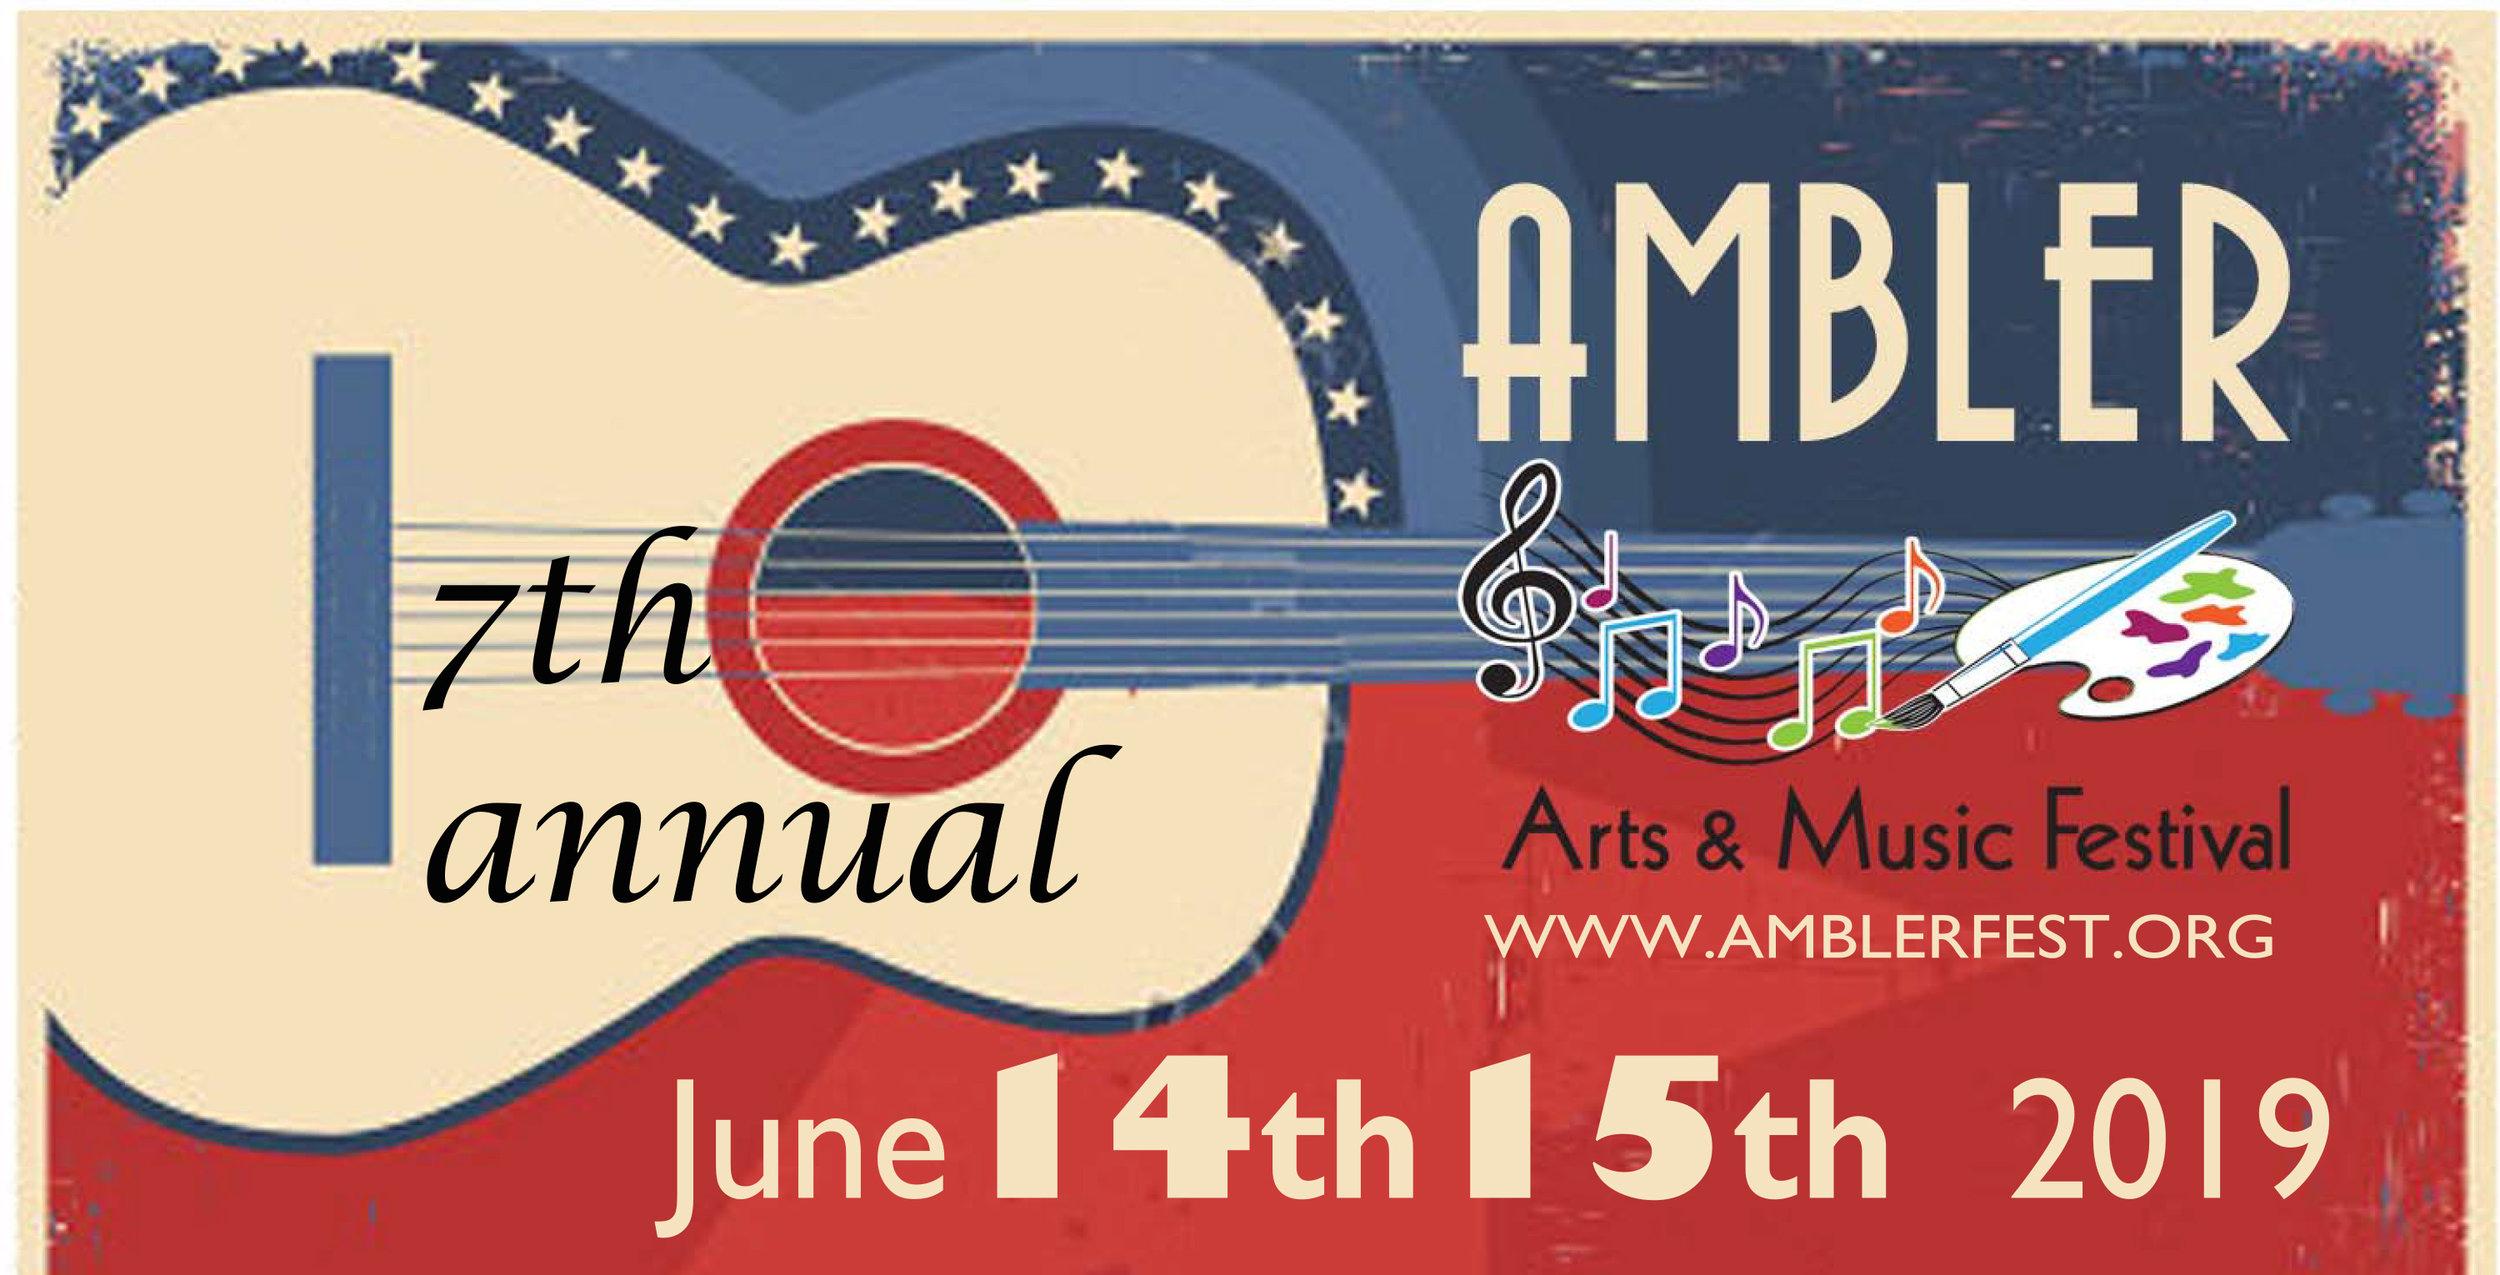 2019 Amblerfest Poster revised.jpg